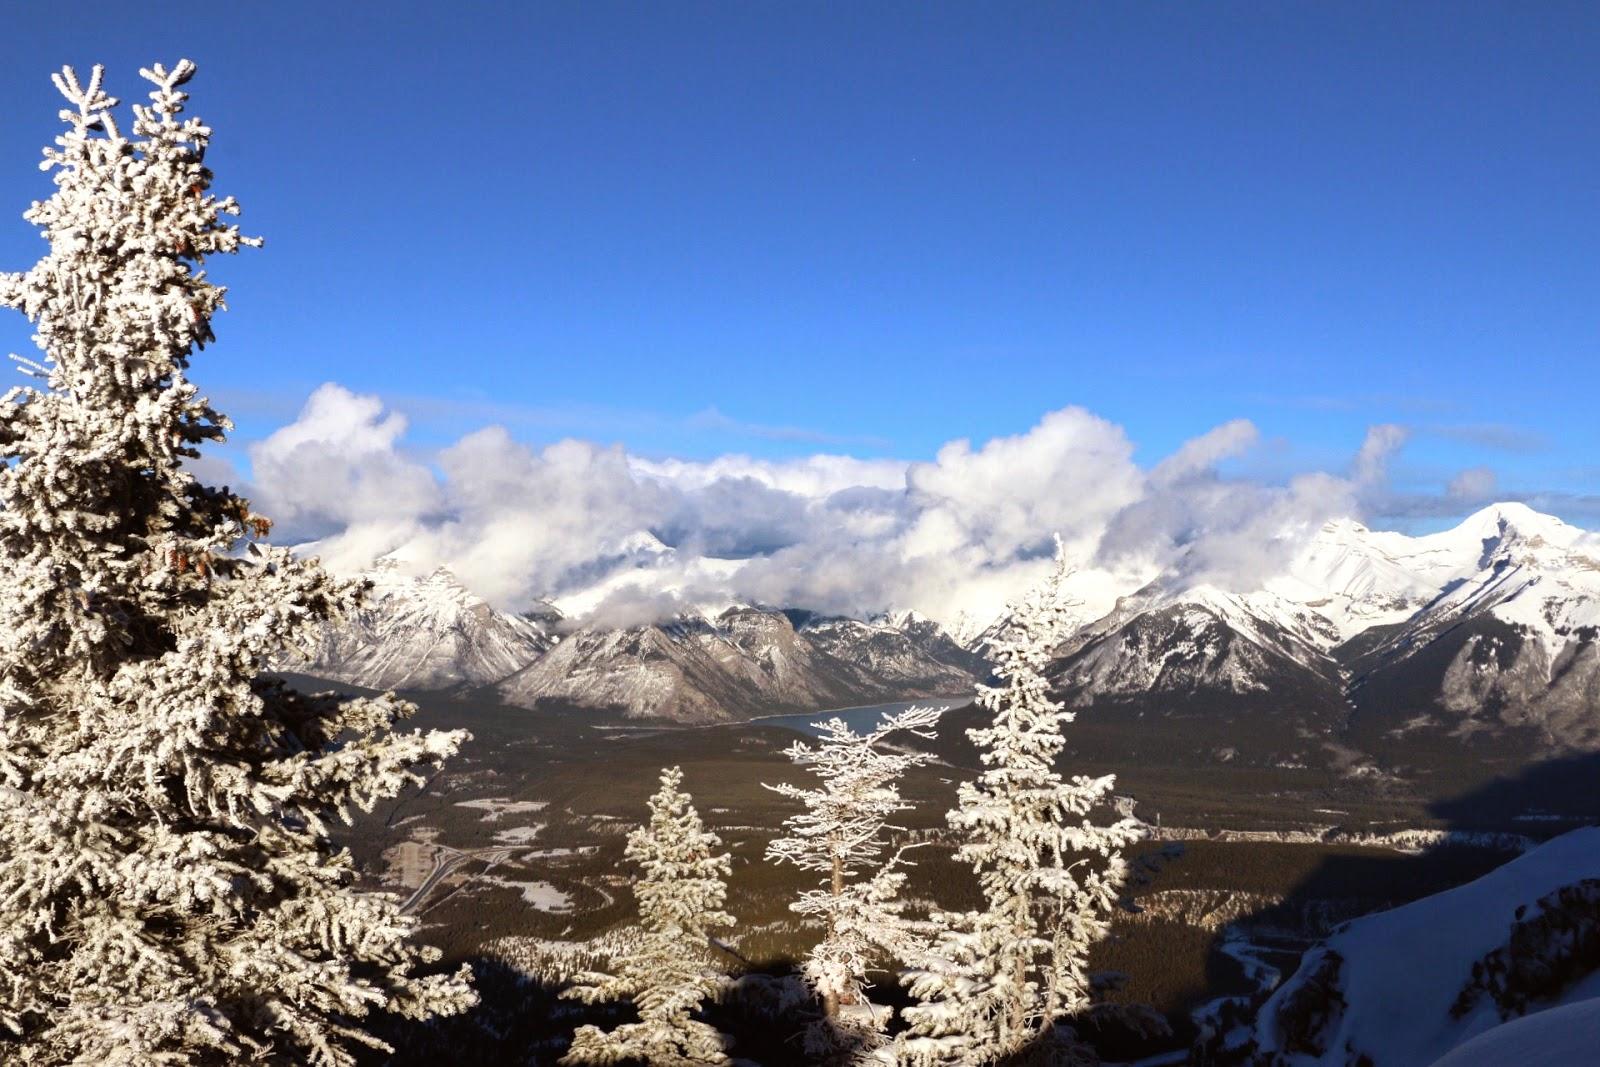 Sulphur Mountain Banff Alberta Canada by Jessica Mack (aka SweetDivergence)